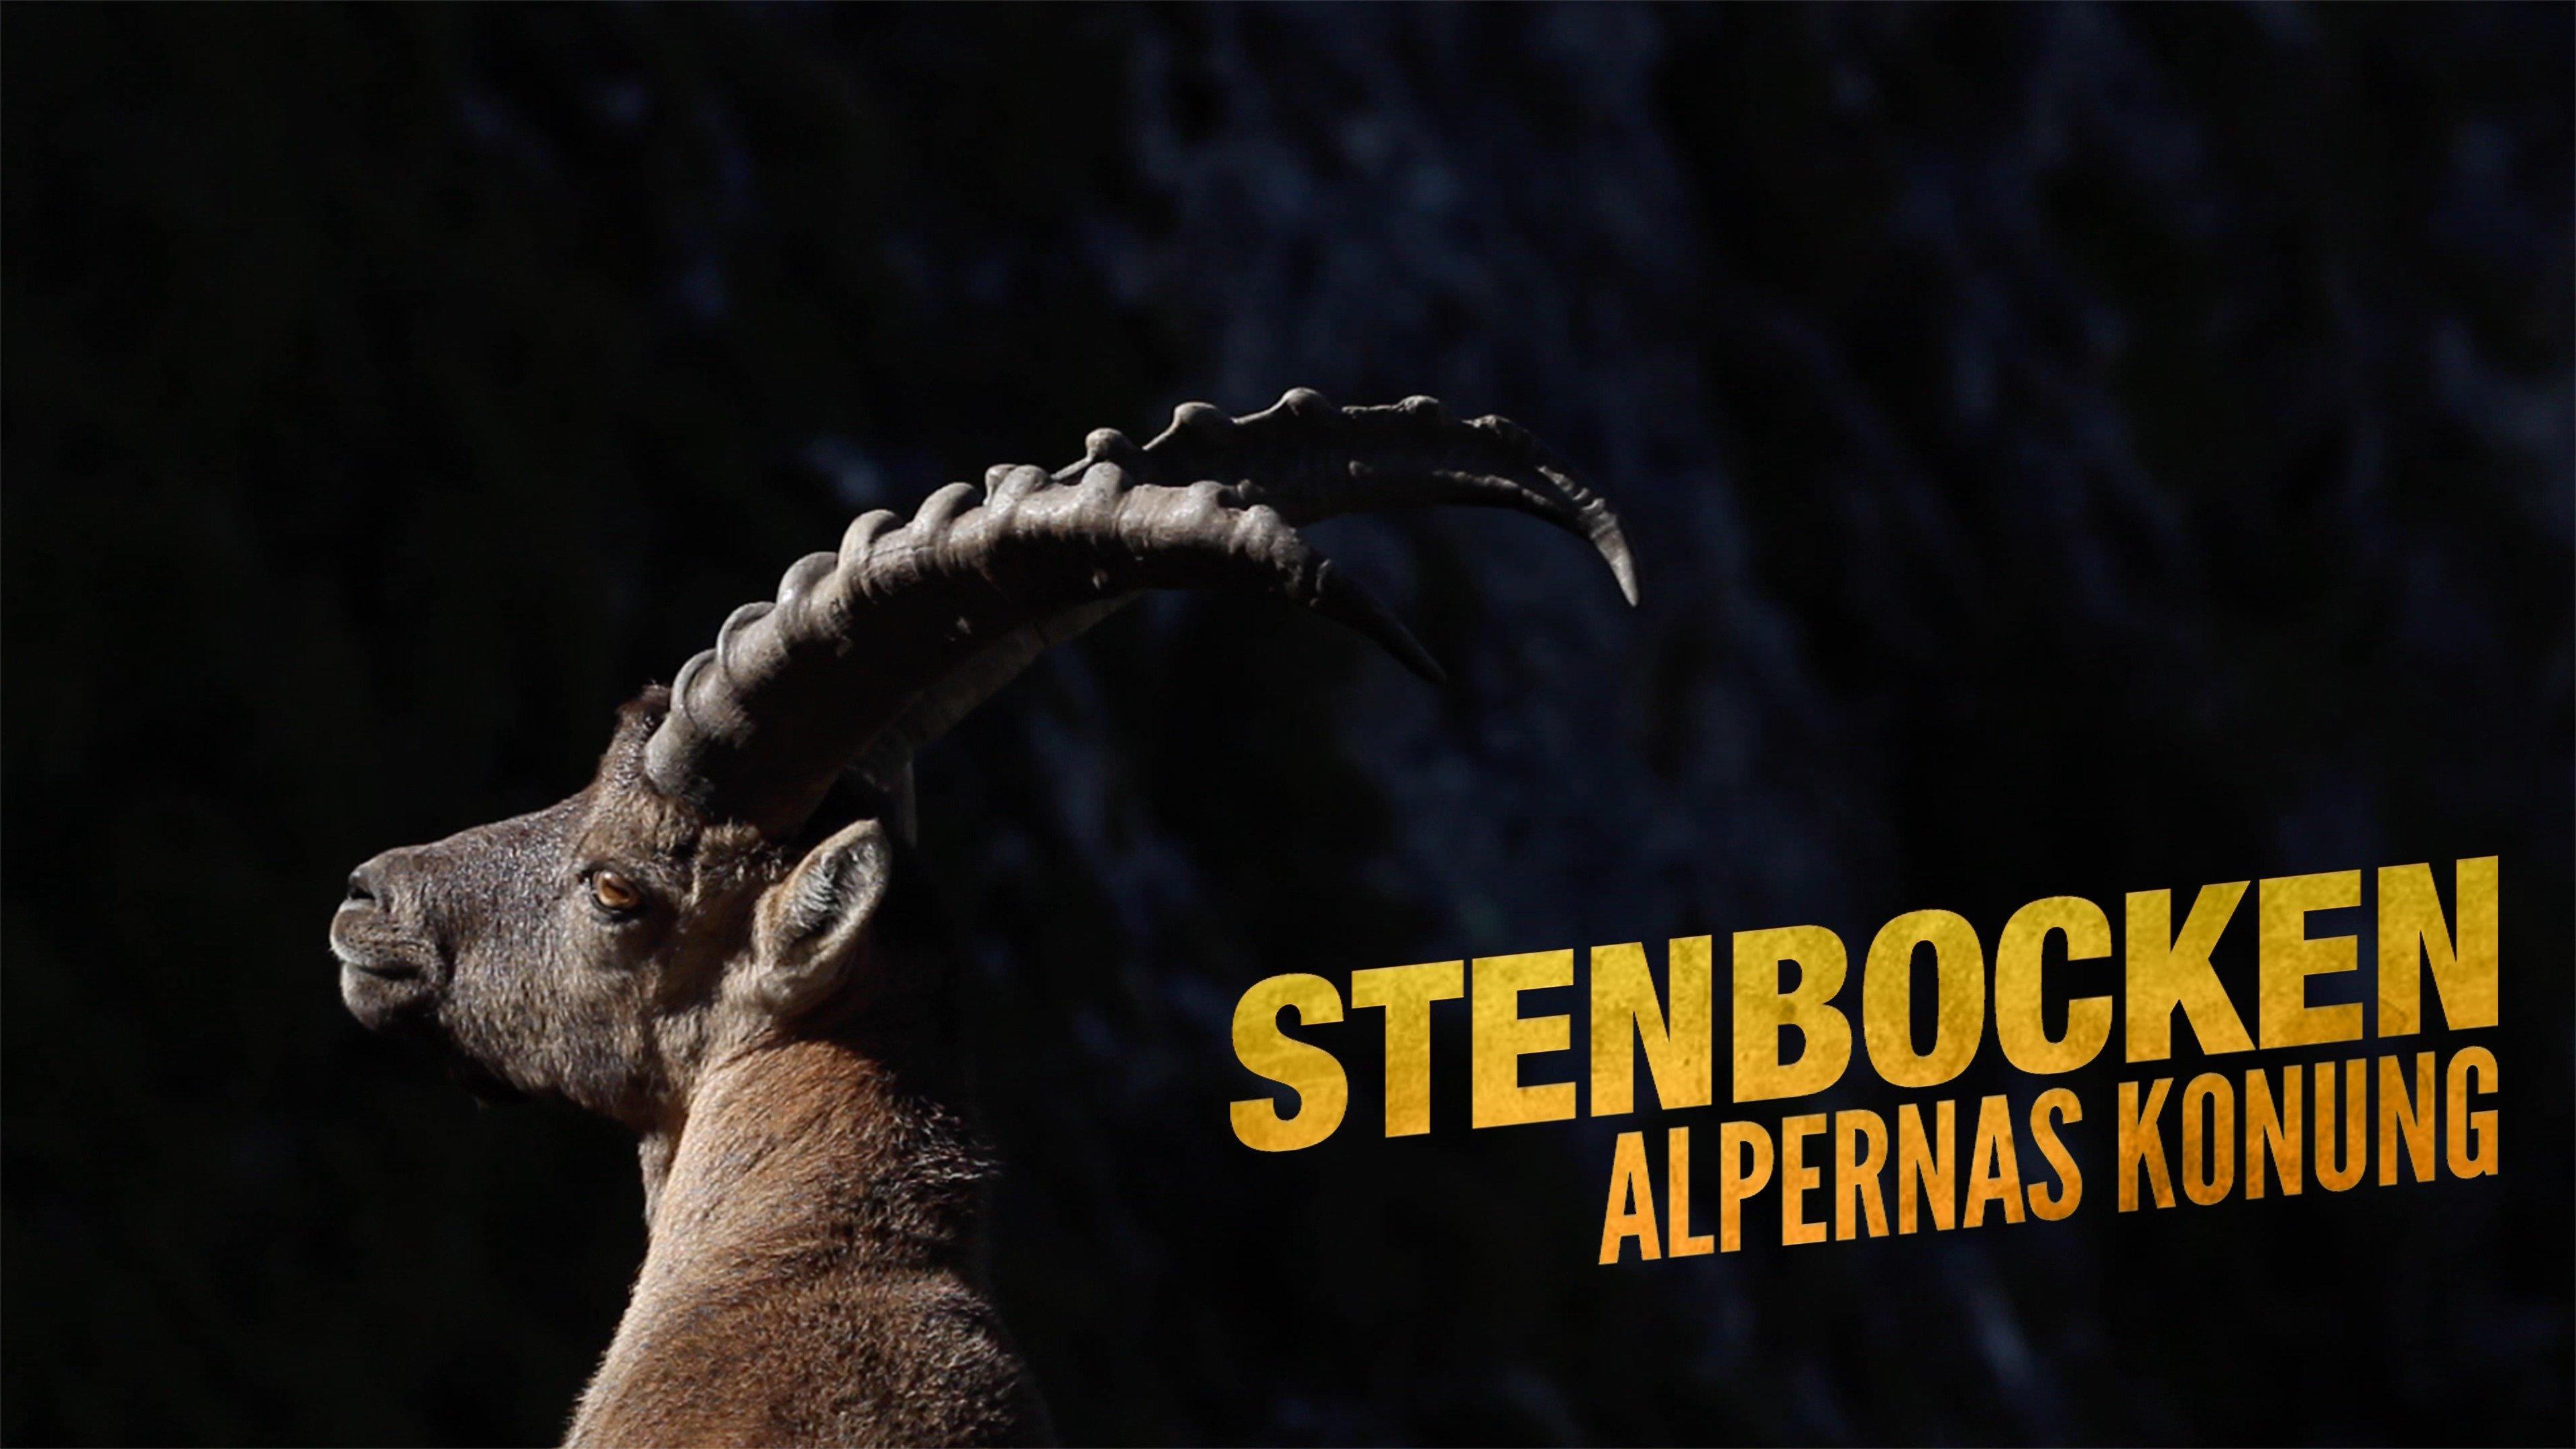 Stenbocken - Alpernas konung